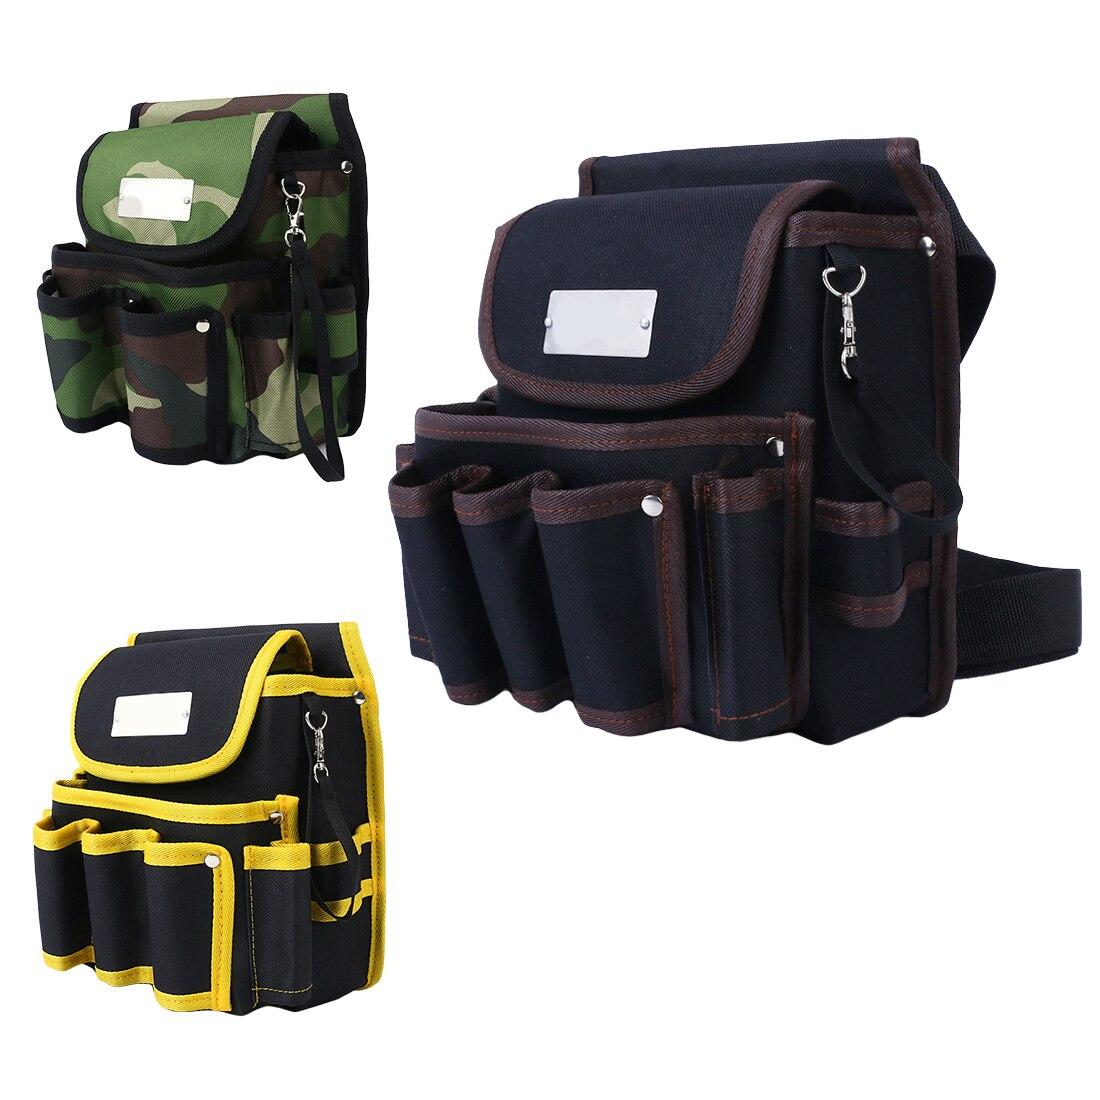 Telecommunications Holder Electrician 600D Water Proof Cloth Rivet Fixed Tool Bag Adjustable Belt Pocket Pouch 23 X 13 X 23cm